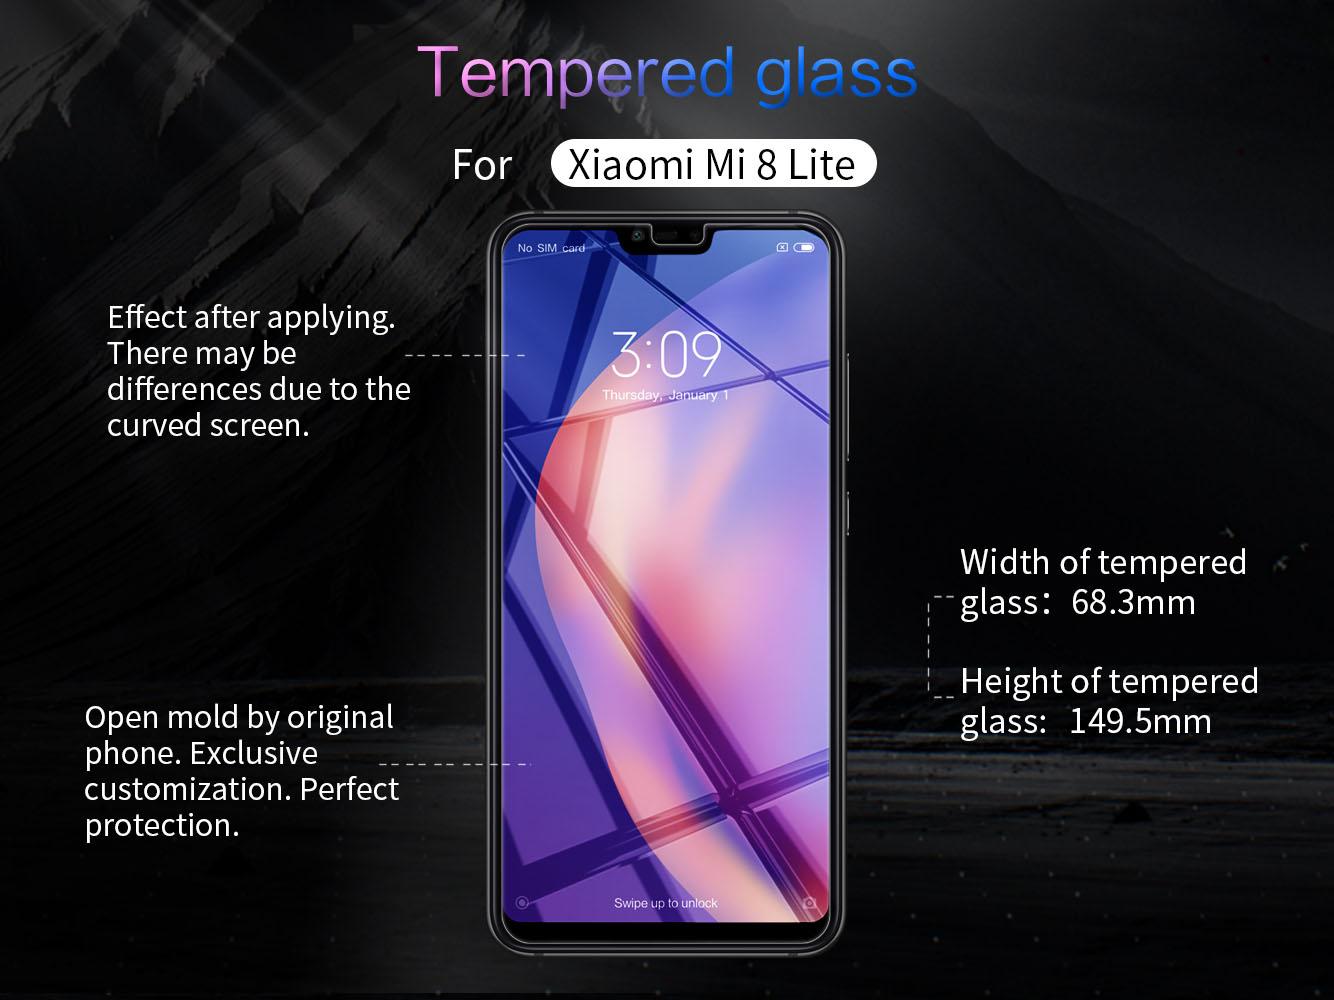 XIAOMI Mi 8 Lite screen protector